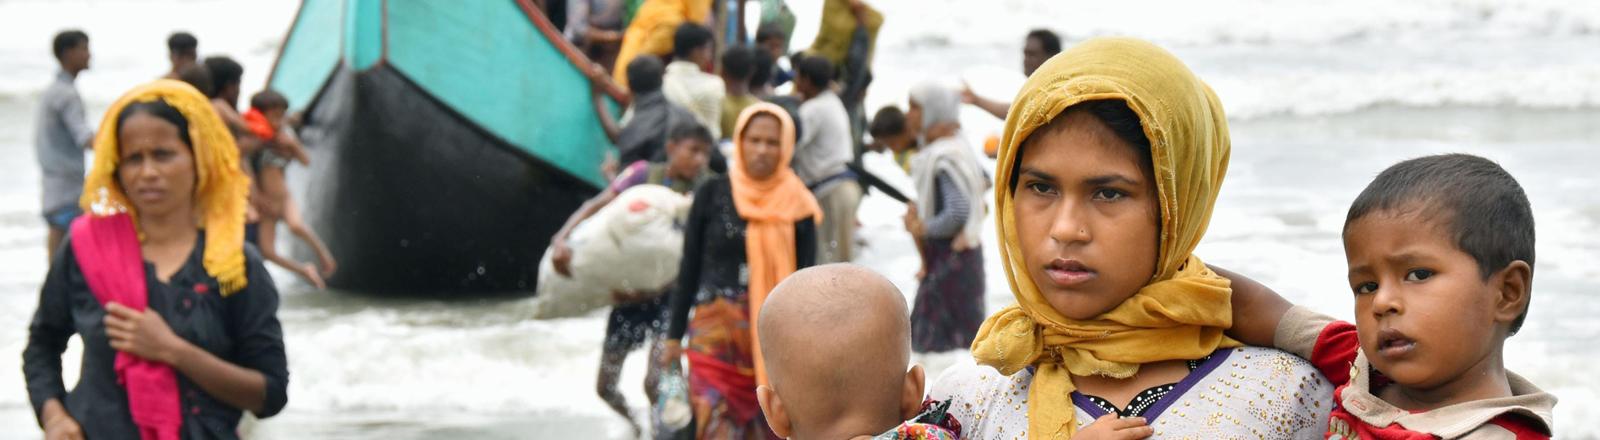 Rohingya fliehen per Schiff